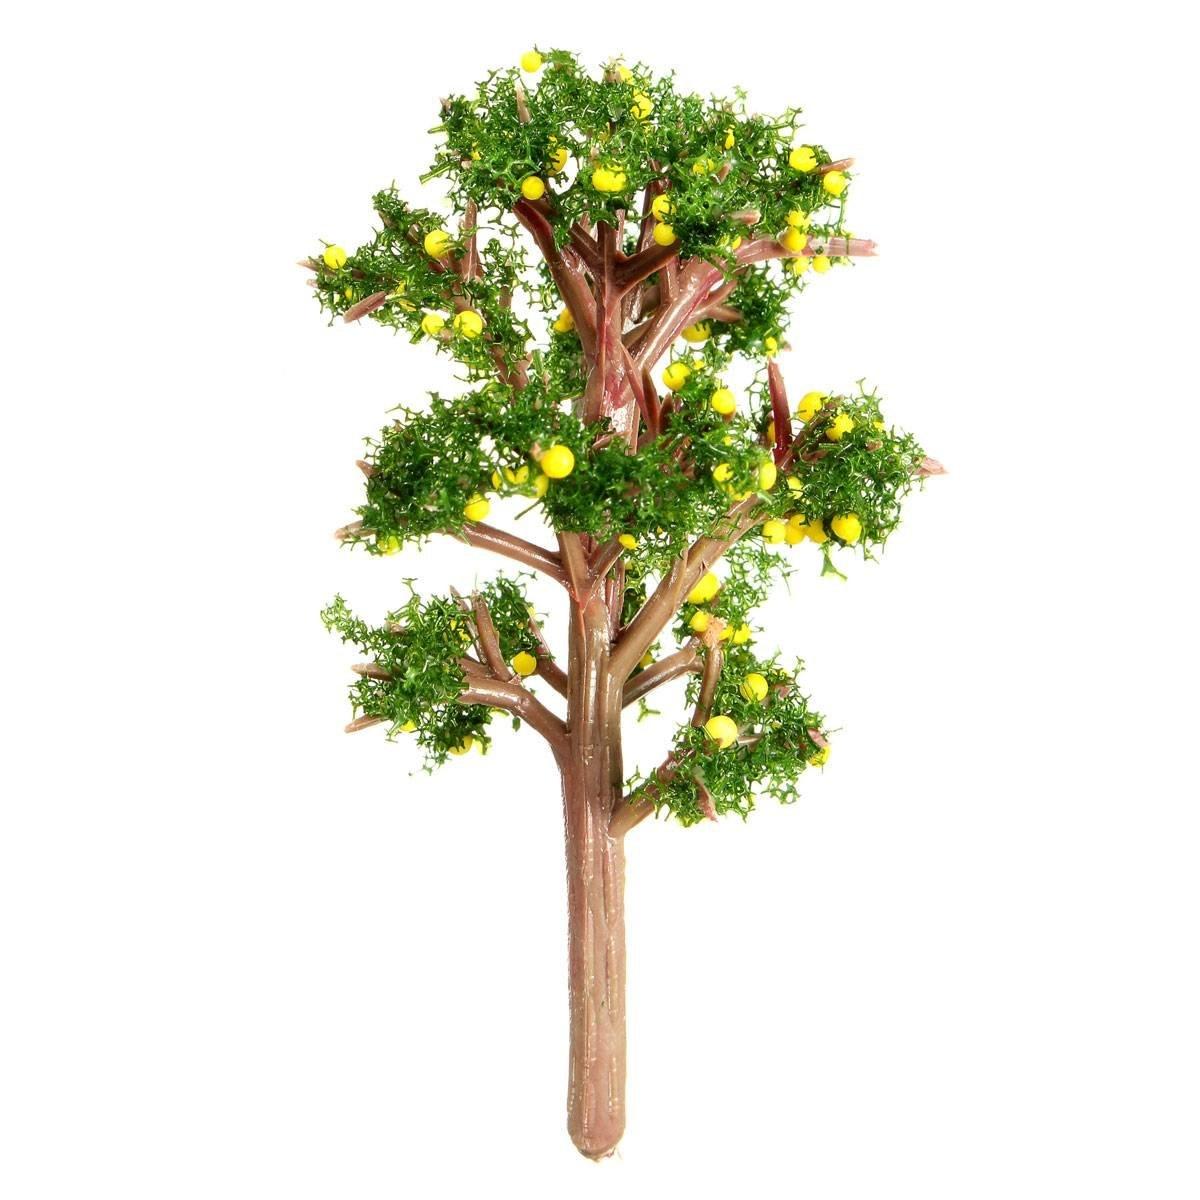 HGHO-Miniature Emulation Orange Tree Moss Bonsai Micro Landscape DIY Craft Garden Ornament